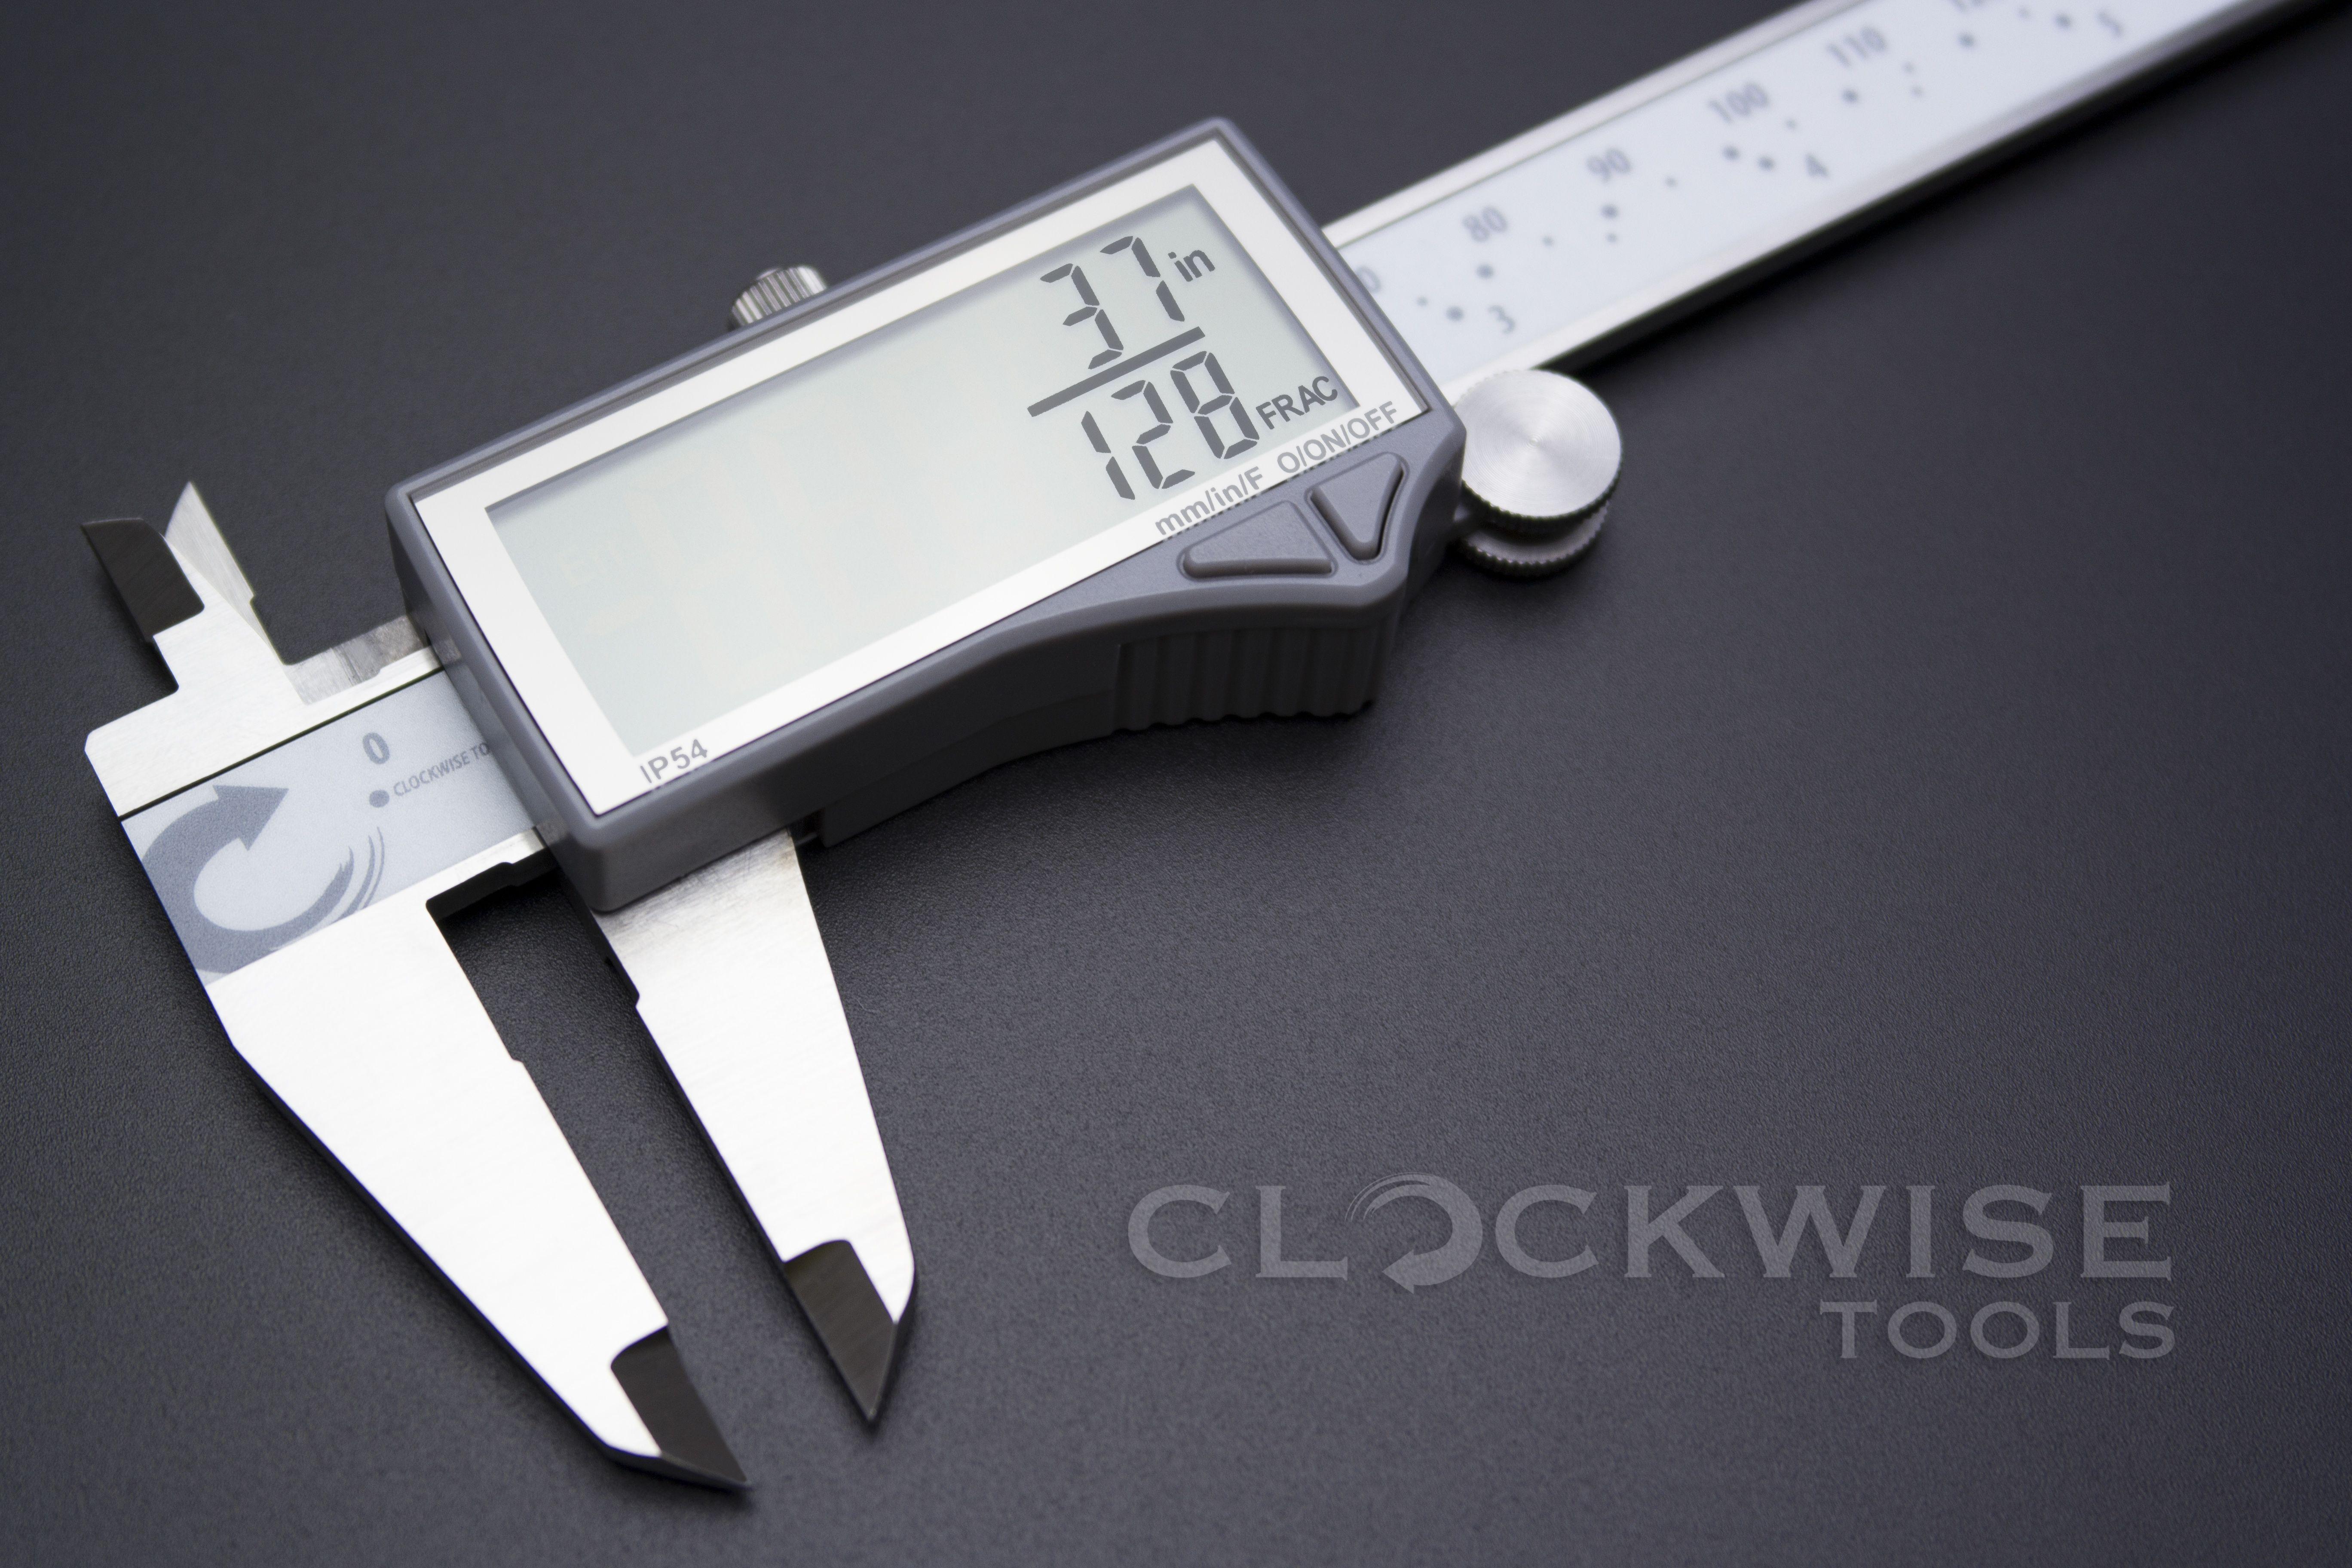 Clockwise Tools DCLR-0605 Electronic Digital Caliper Inch//Metric//Fractions Conve